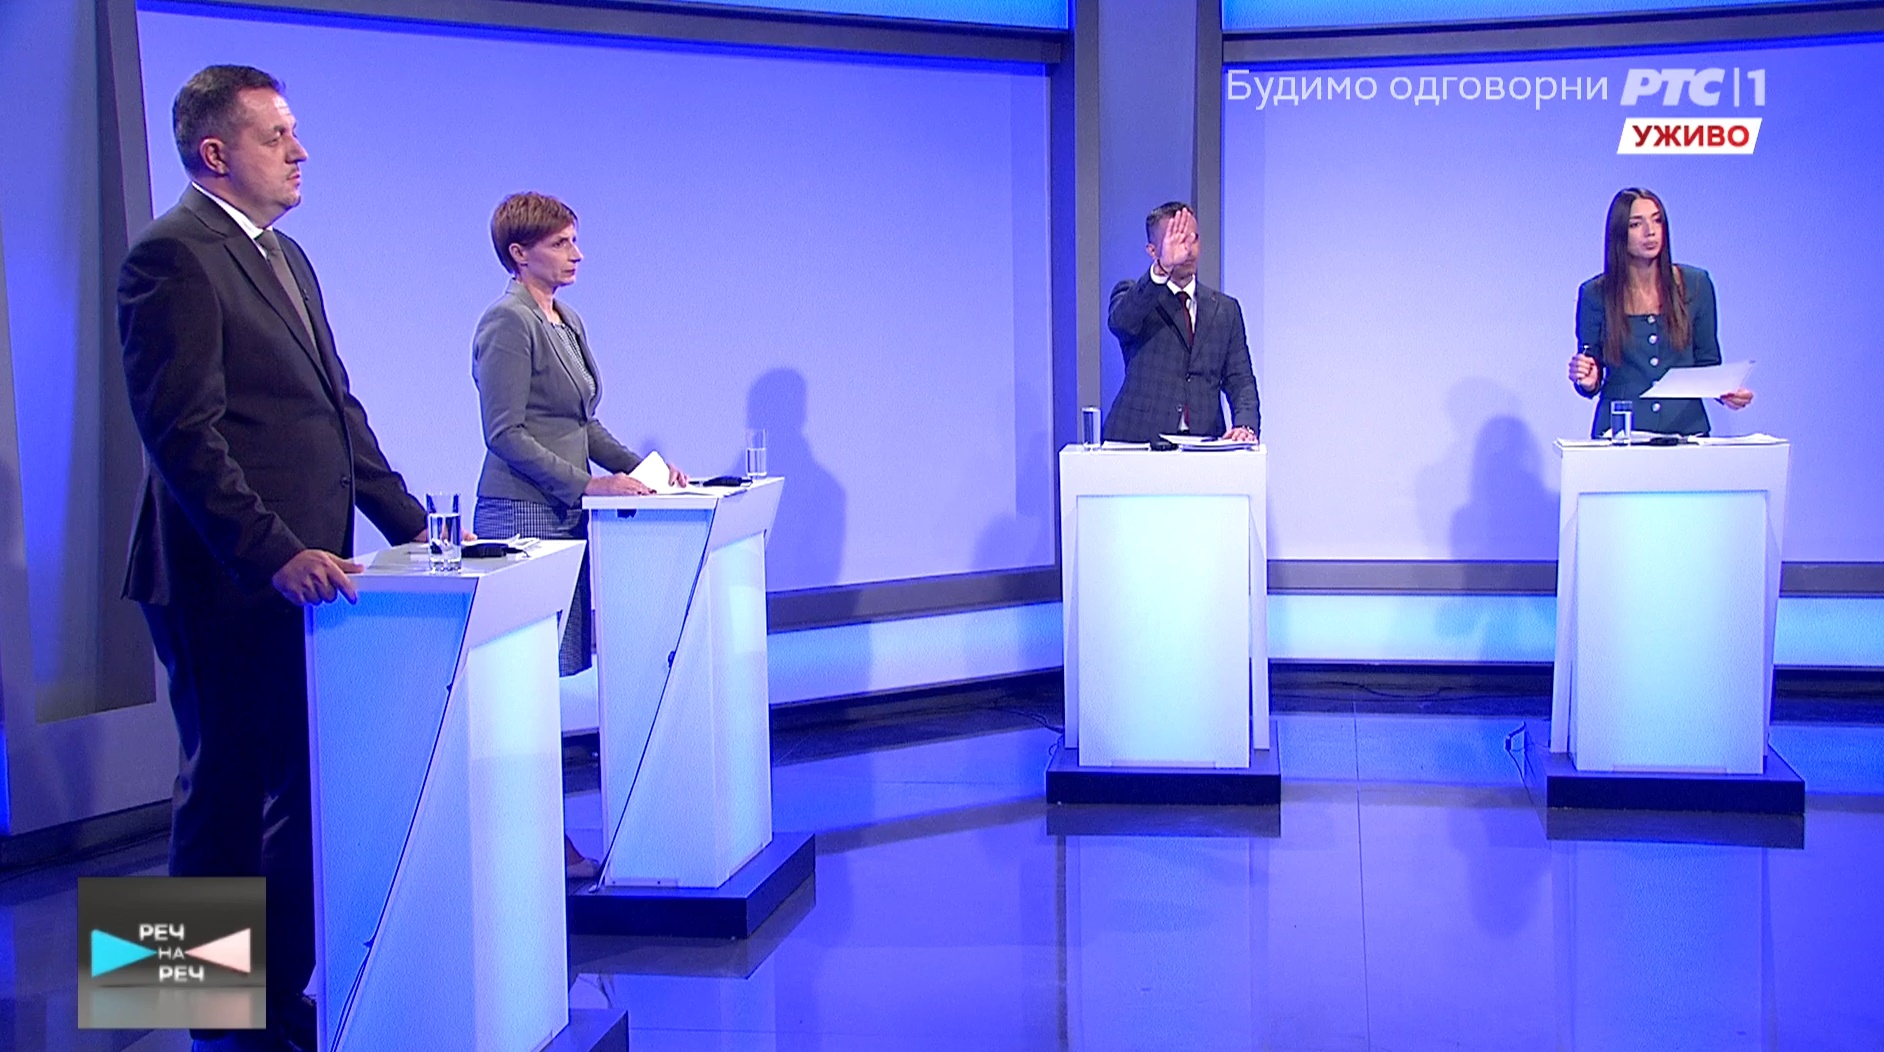 Dragana Rakić, Nevena Đurić, Đorđe Milićević, Vojin Biljić u emisiji